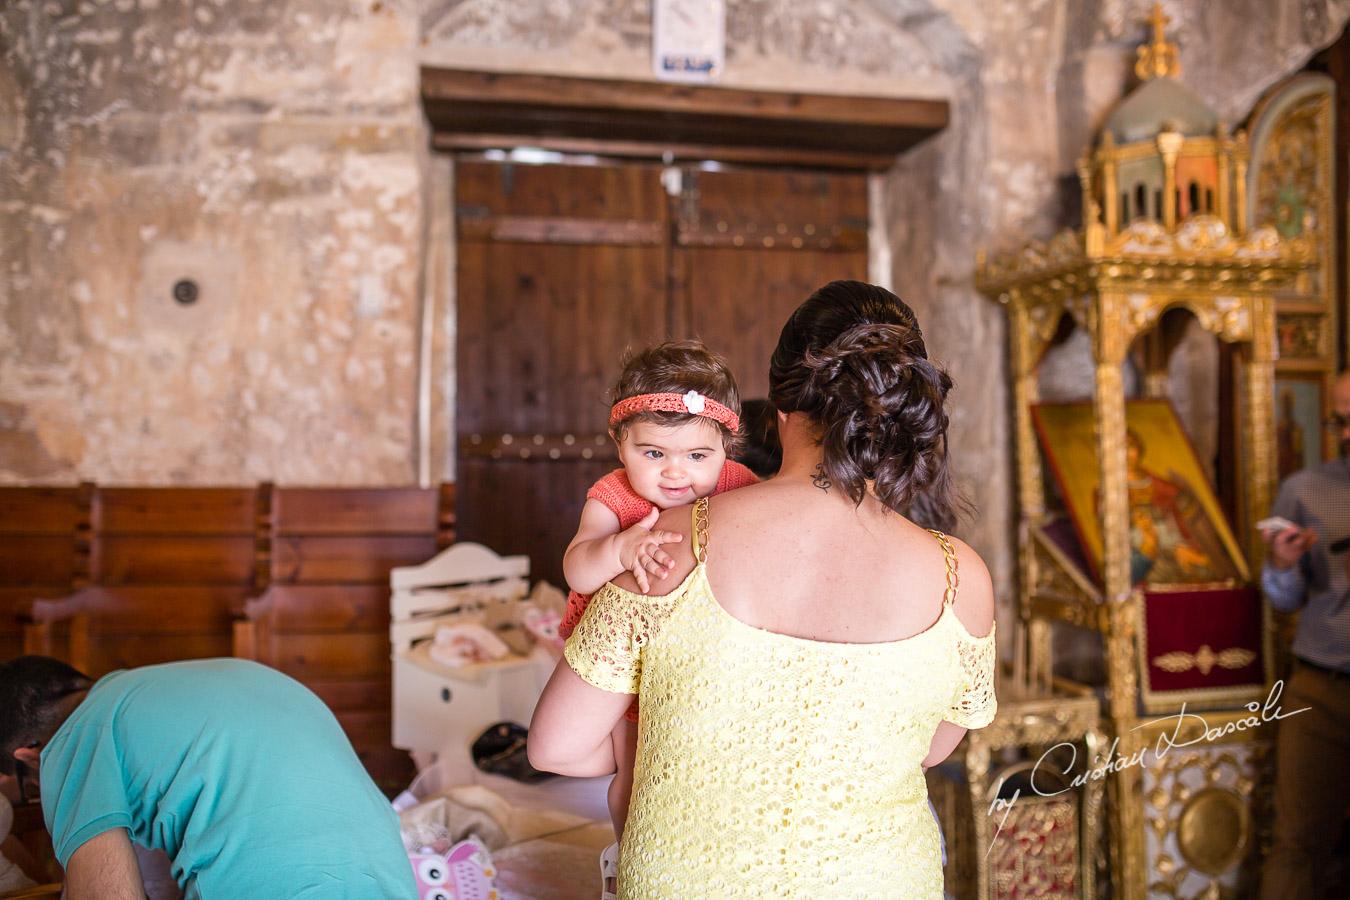 Joyous Christening in Limassol - 12